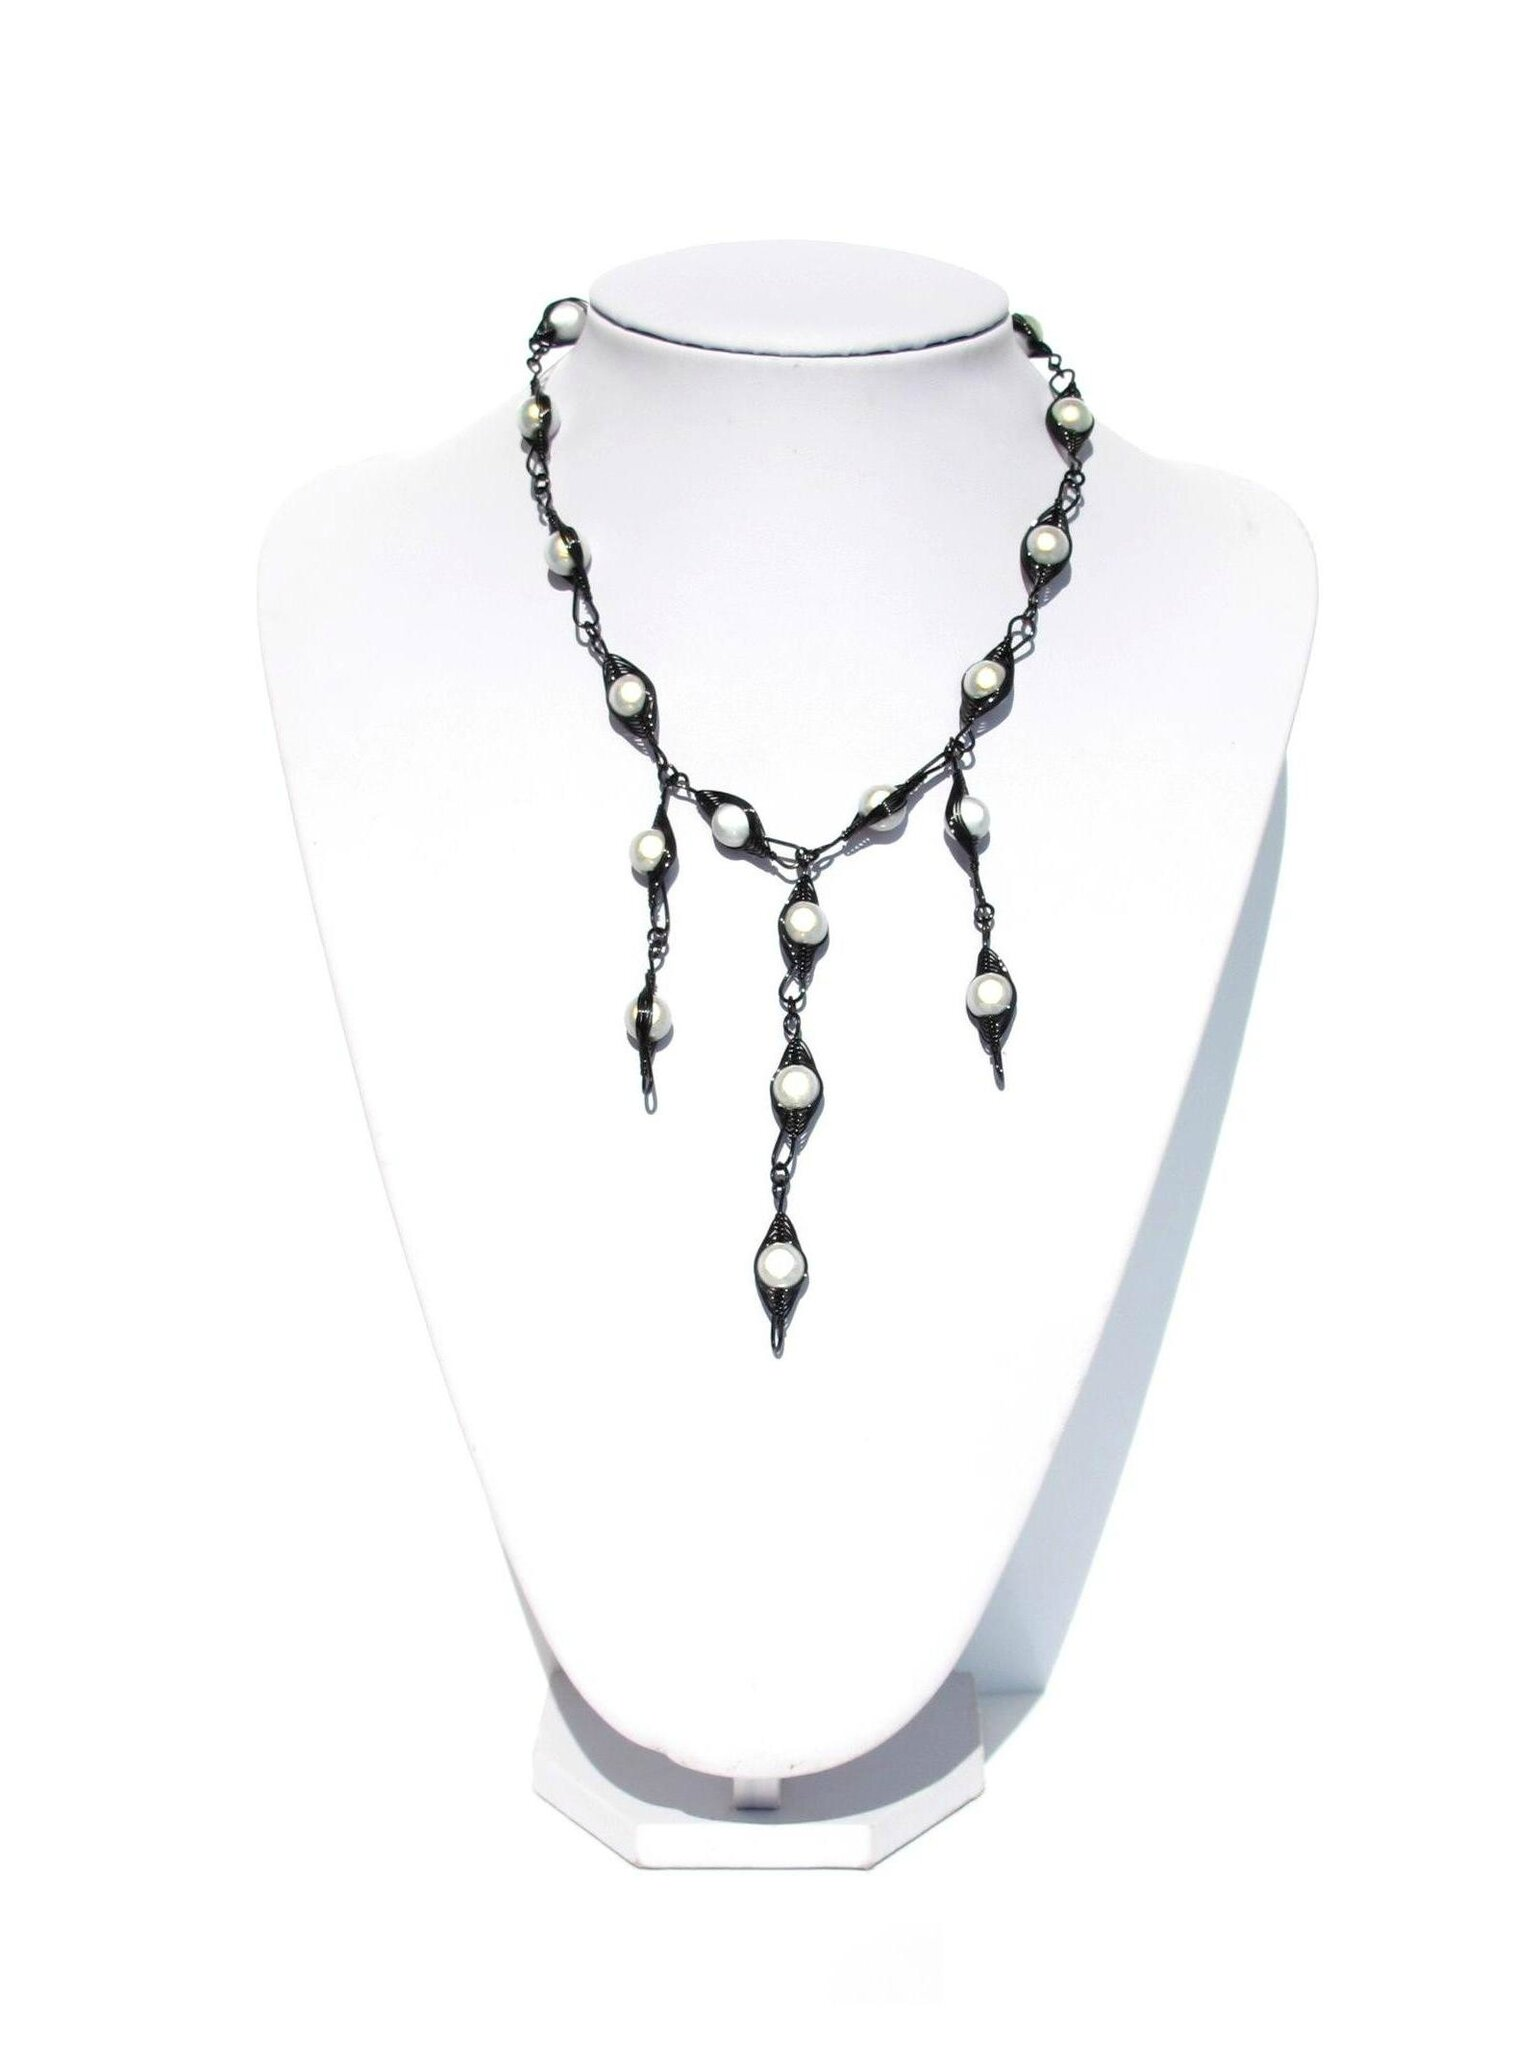 sautoir wire noir perles blanches2